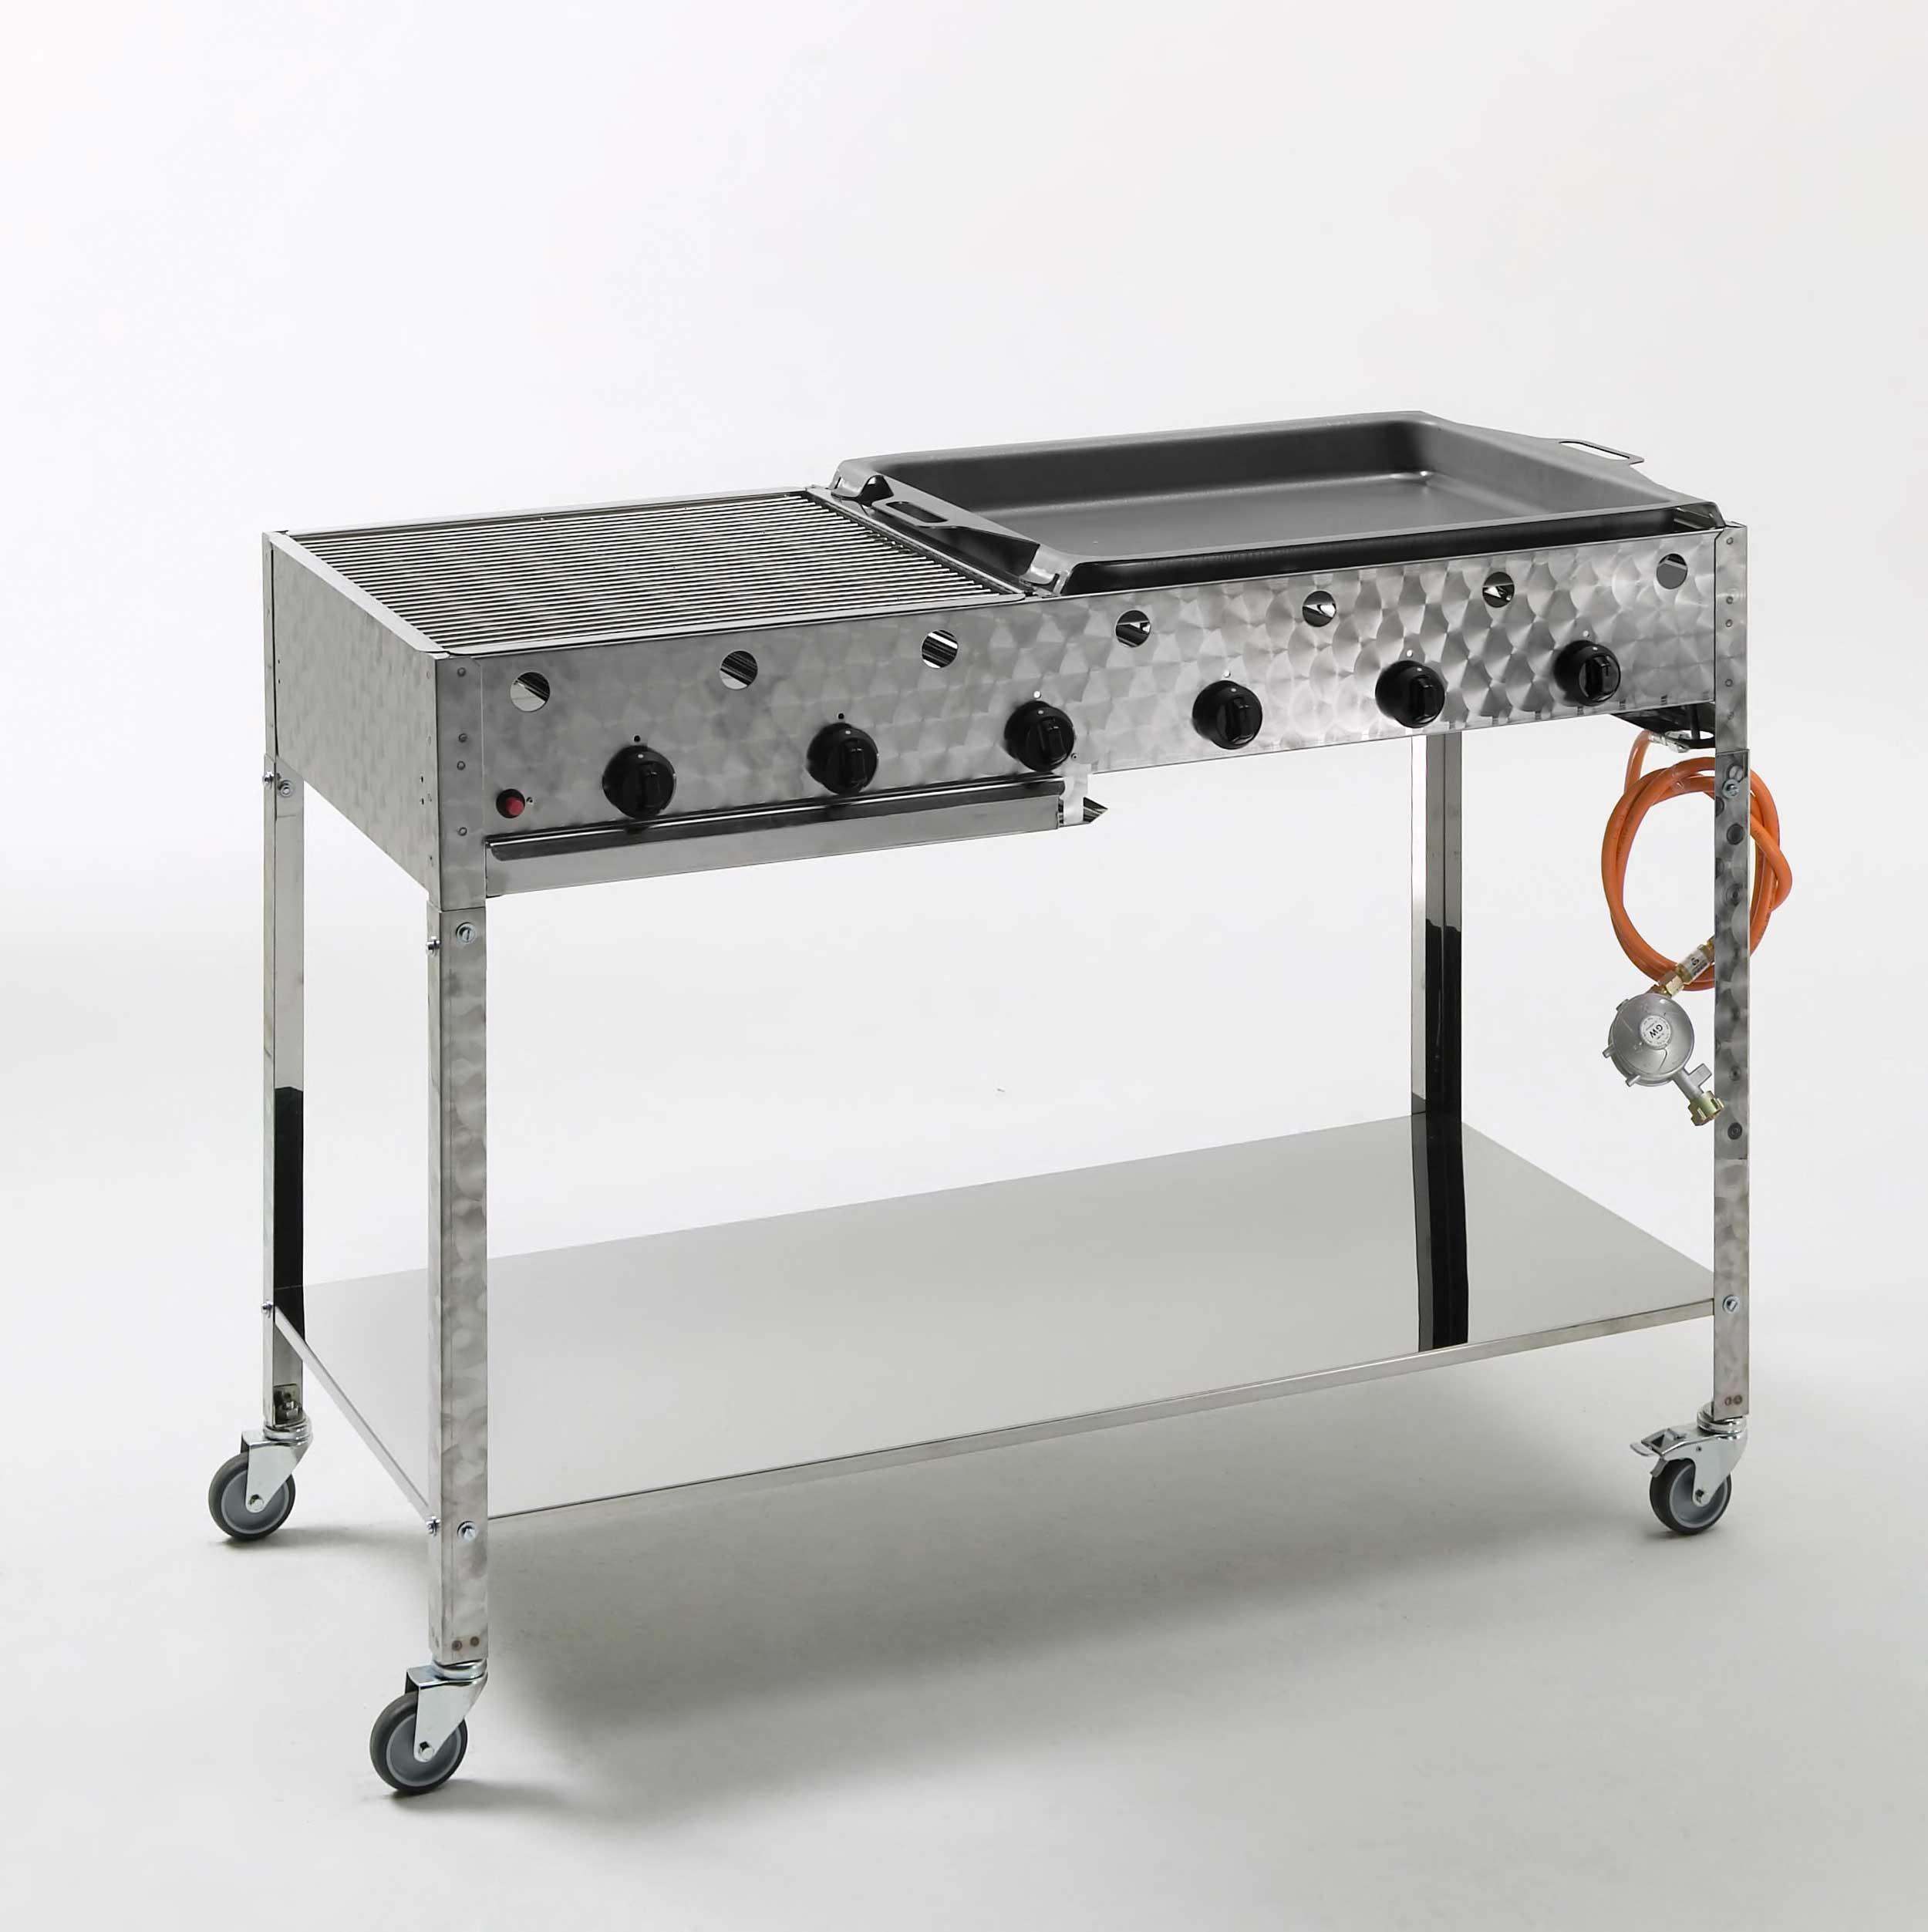 landmann gasbr ter und grillrost 6 flammig 6x4kw 00446m. Black Bedroom Furniture Sets. Home Design Ideas